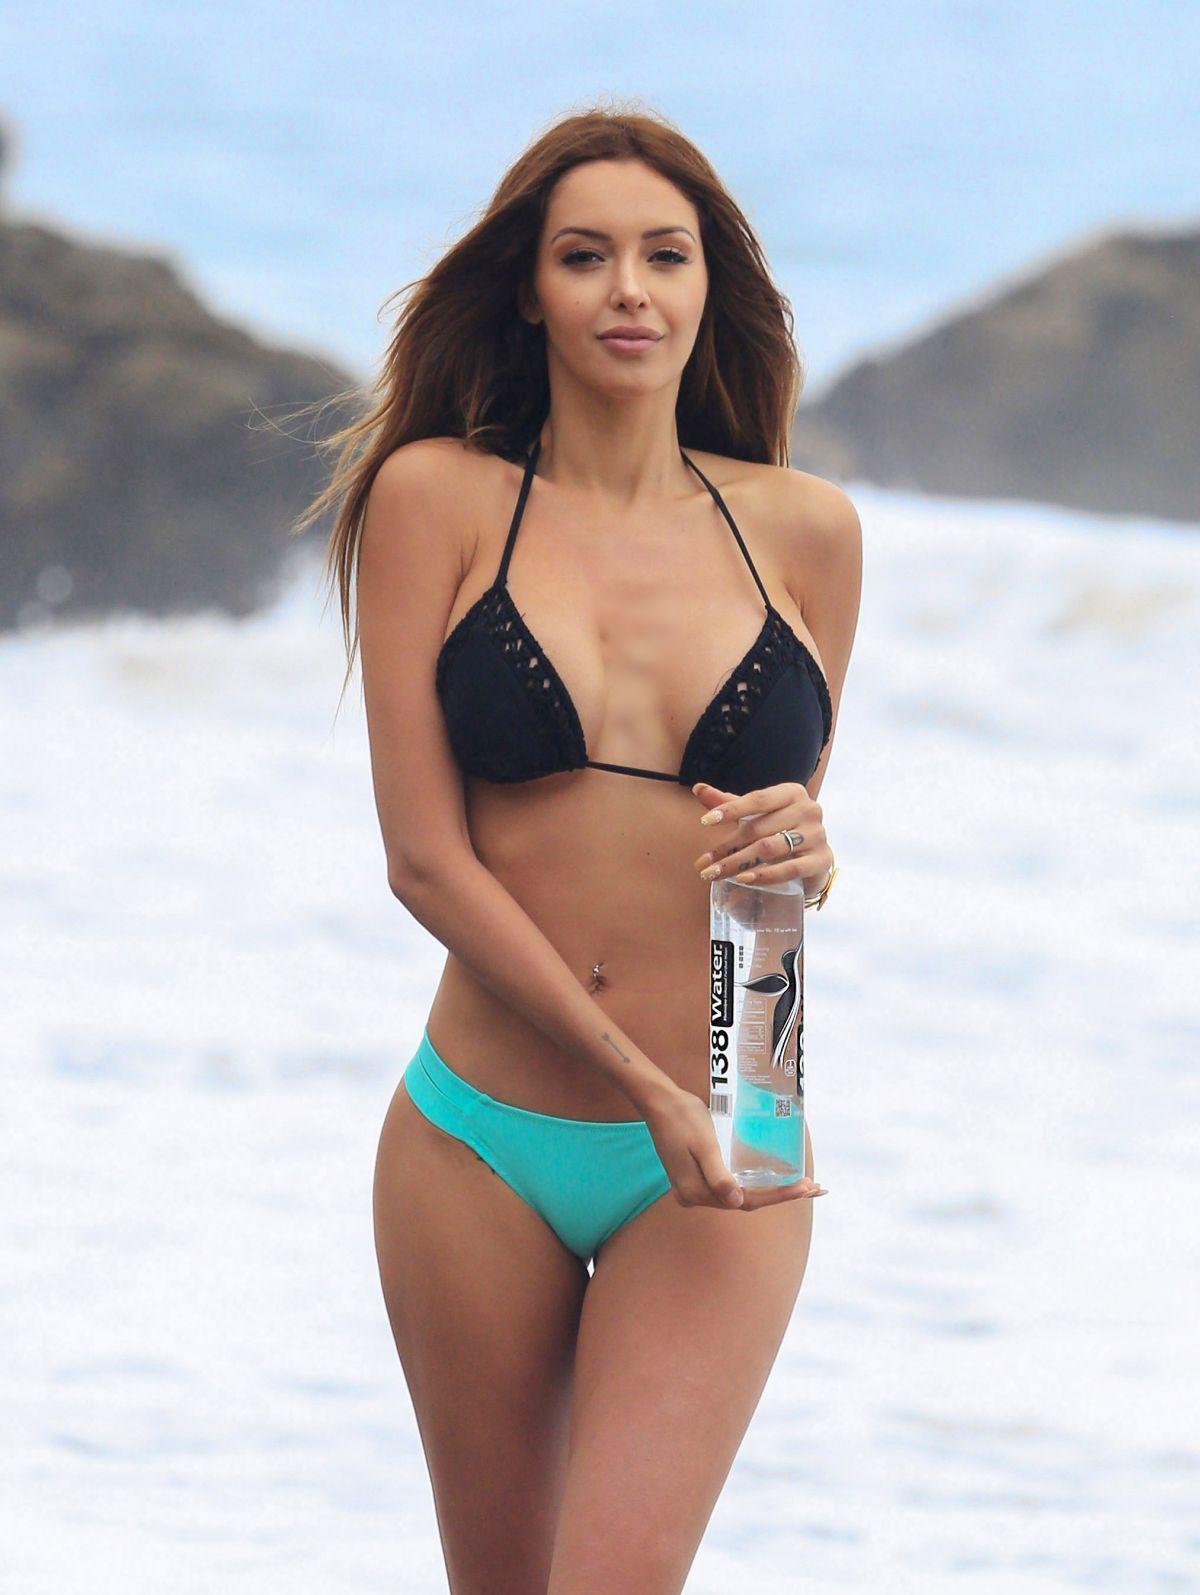 NABILLA BENATTIA in Bikini for 138 Water Photoshoot at Miami Beach 04/27/2017